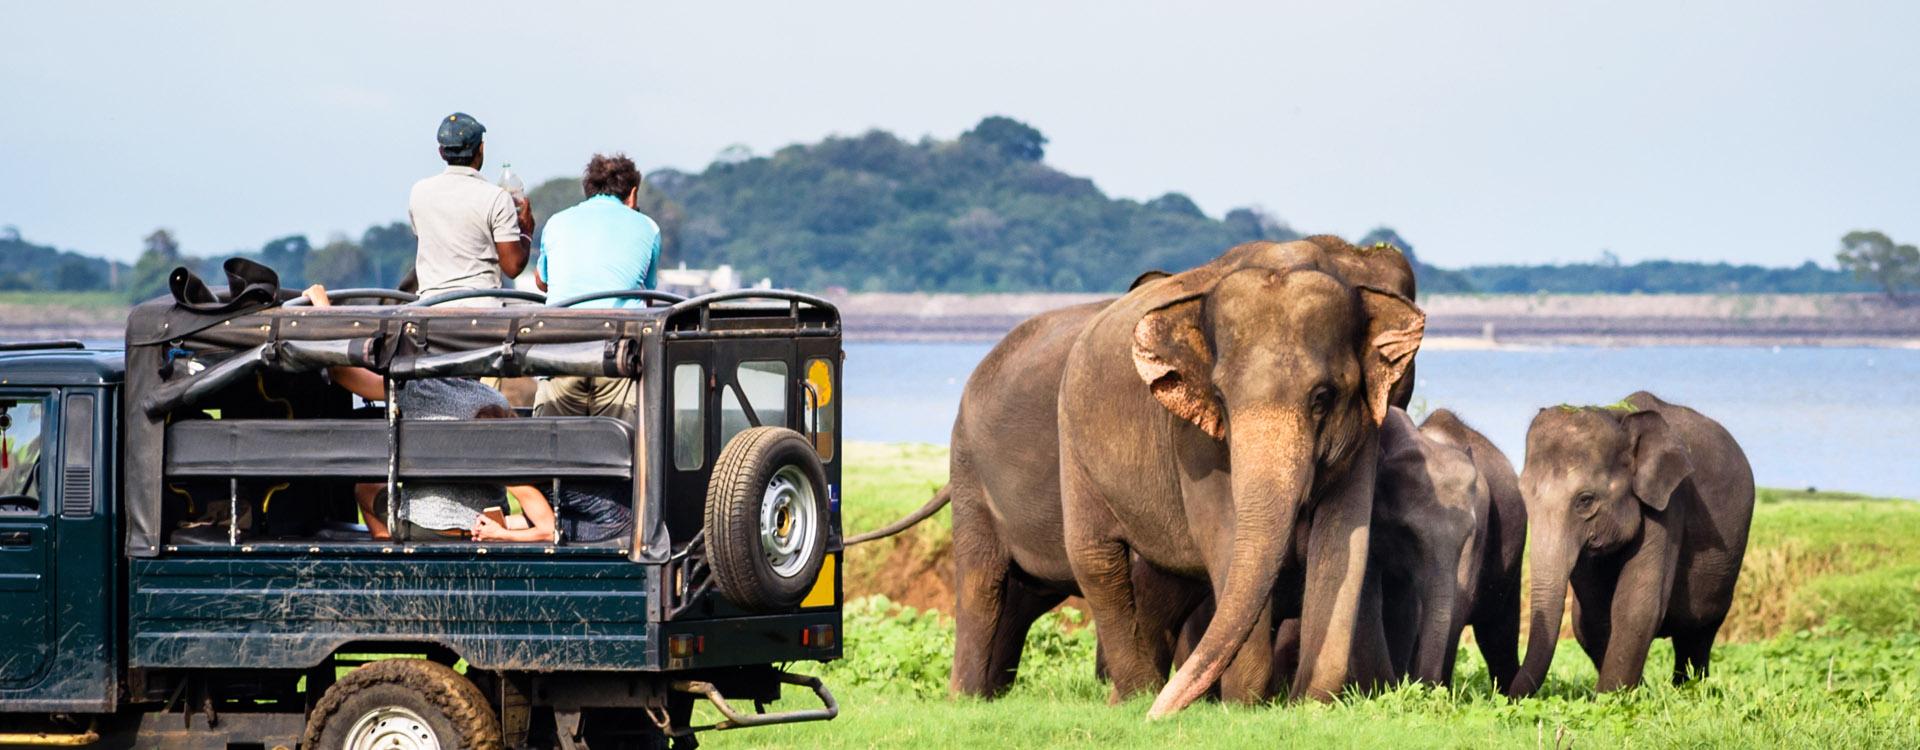 Elepahants safari in Minneriya, Sri Lanka